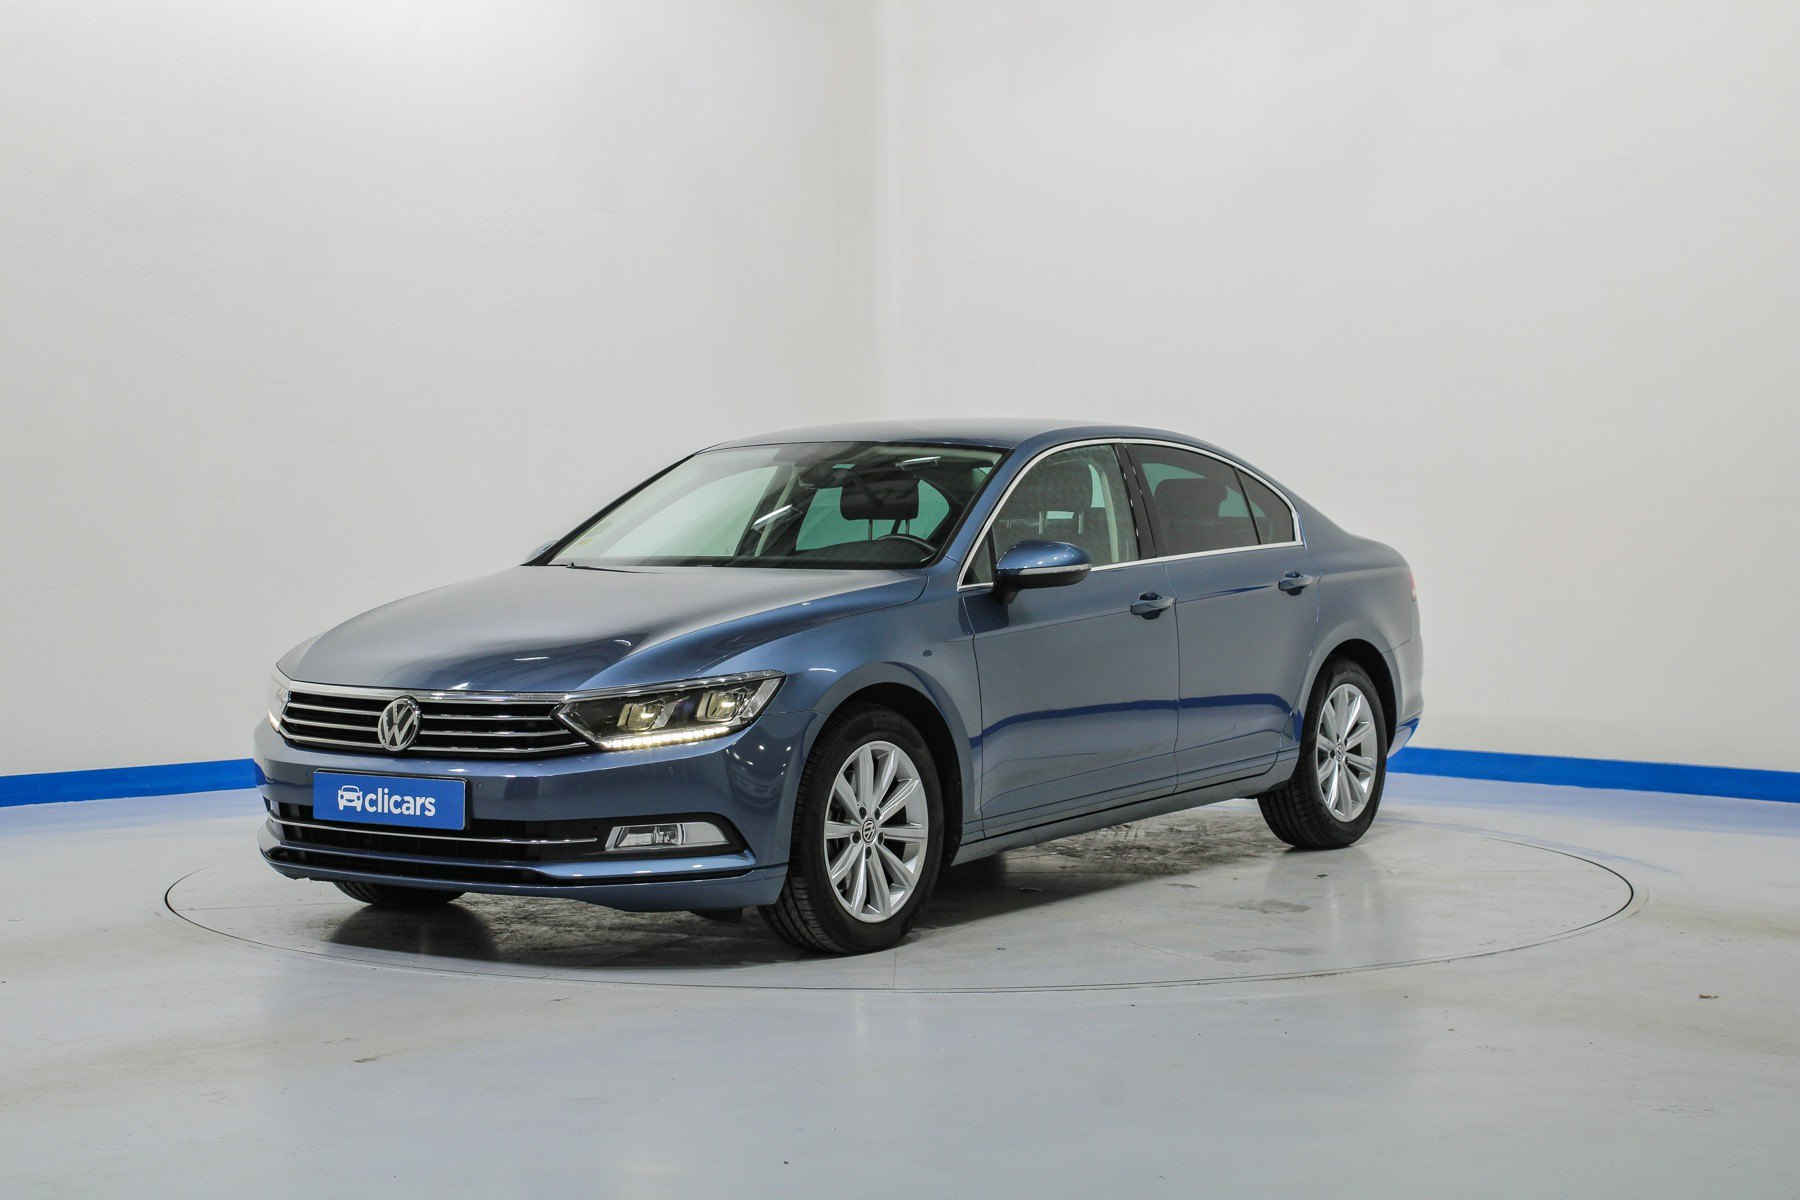 Volkswagen Passat Diésel Advance 2.0 TDI 110kW(150CV) BMT 1